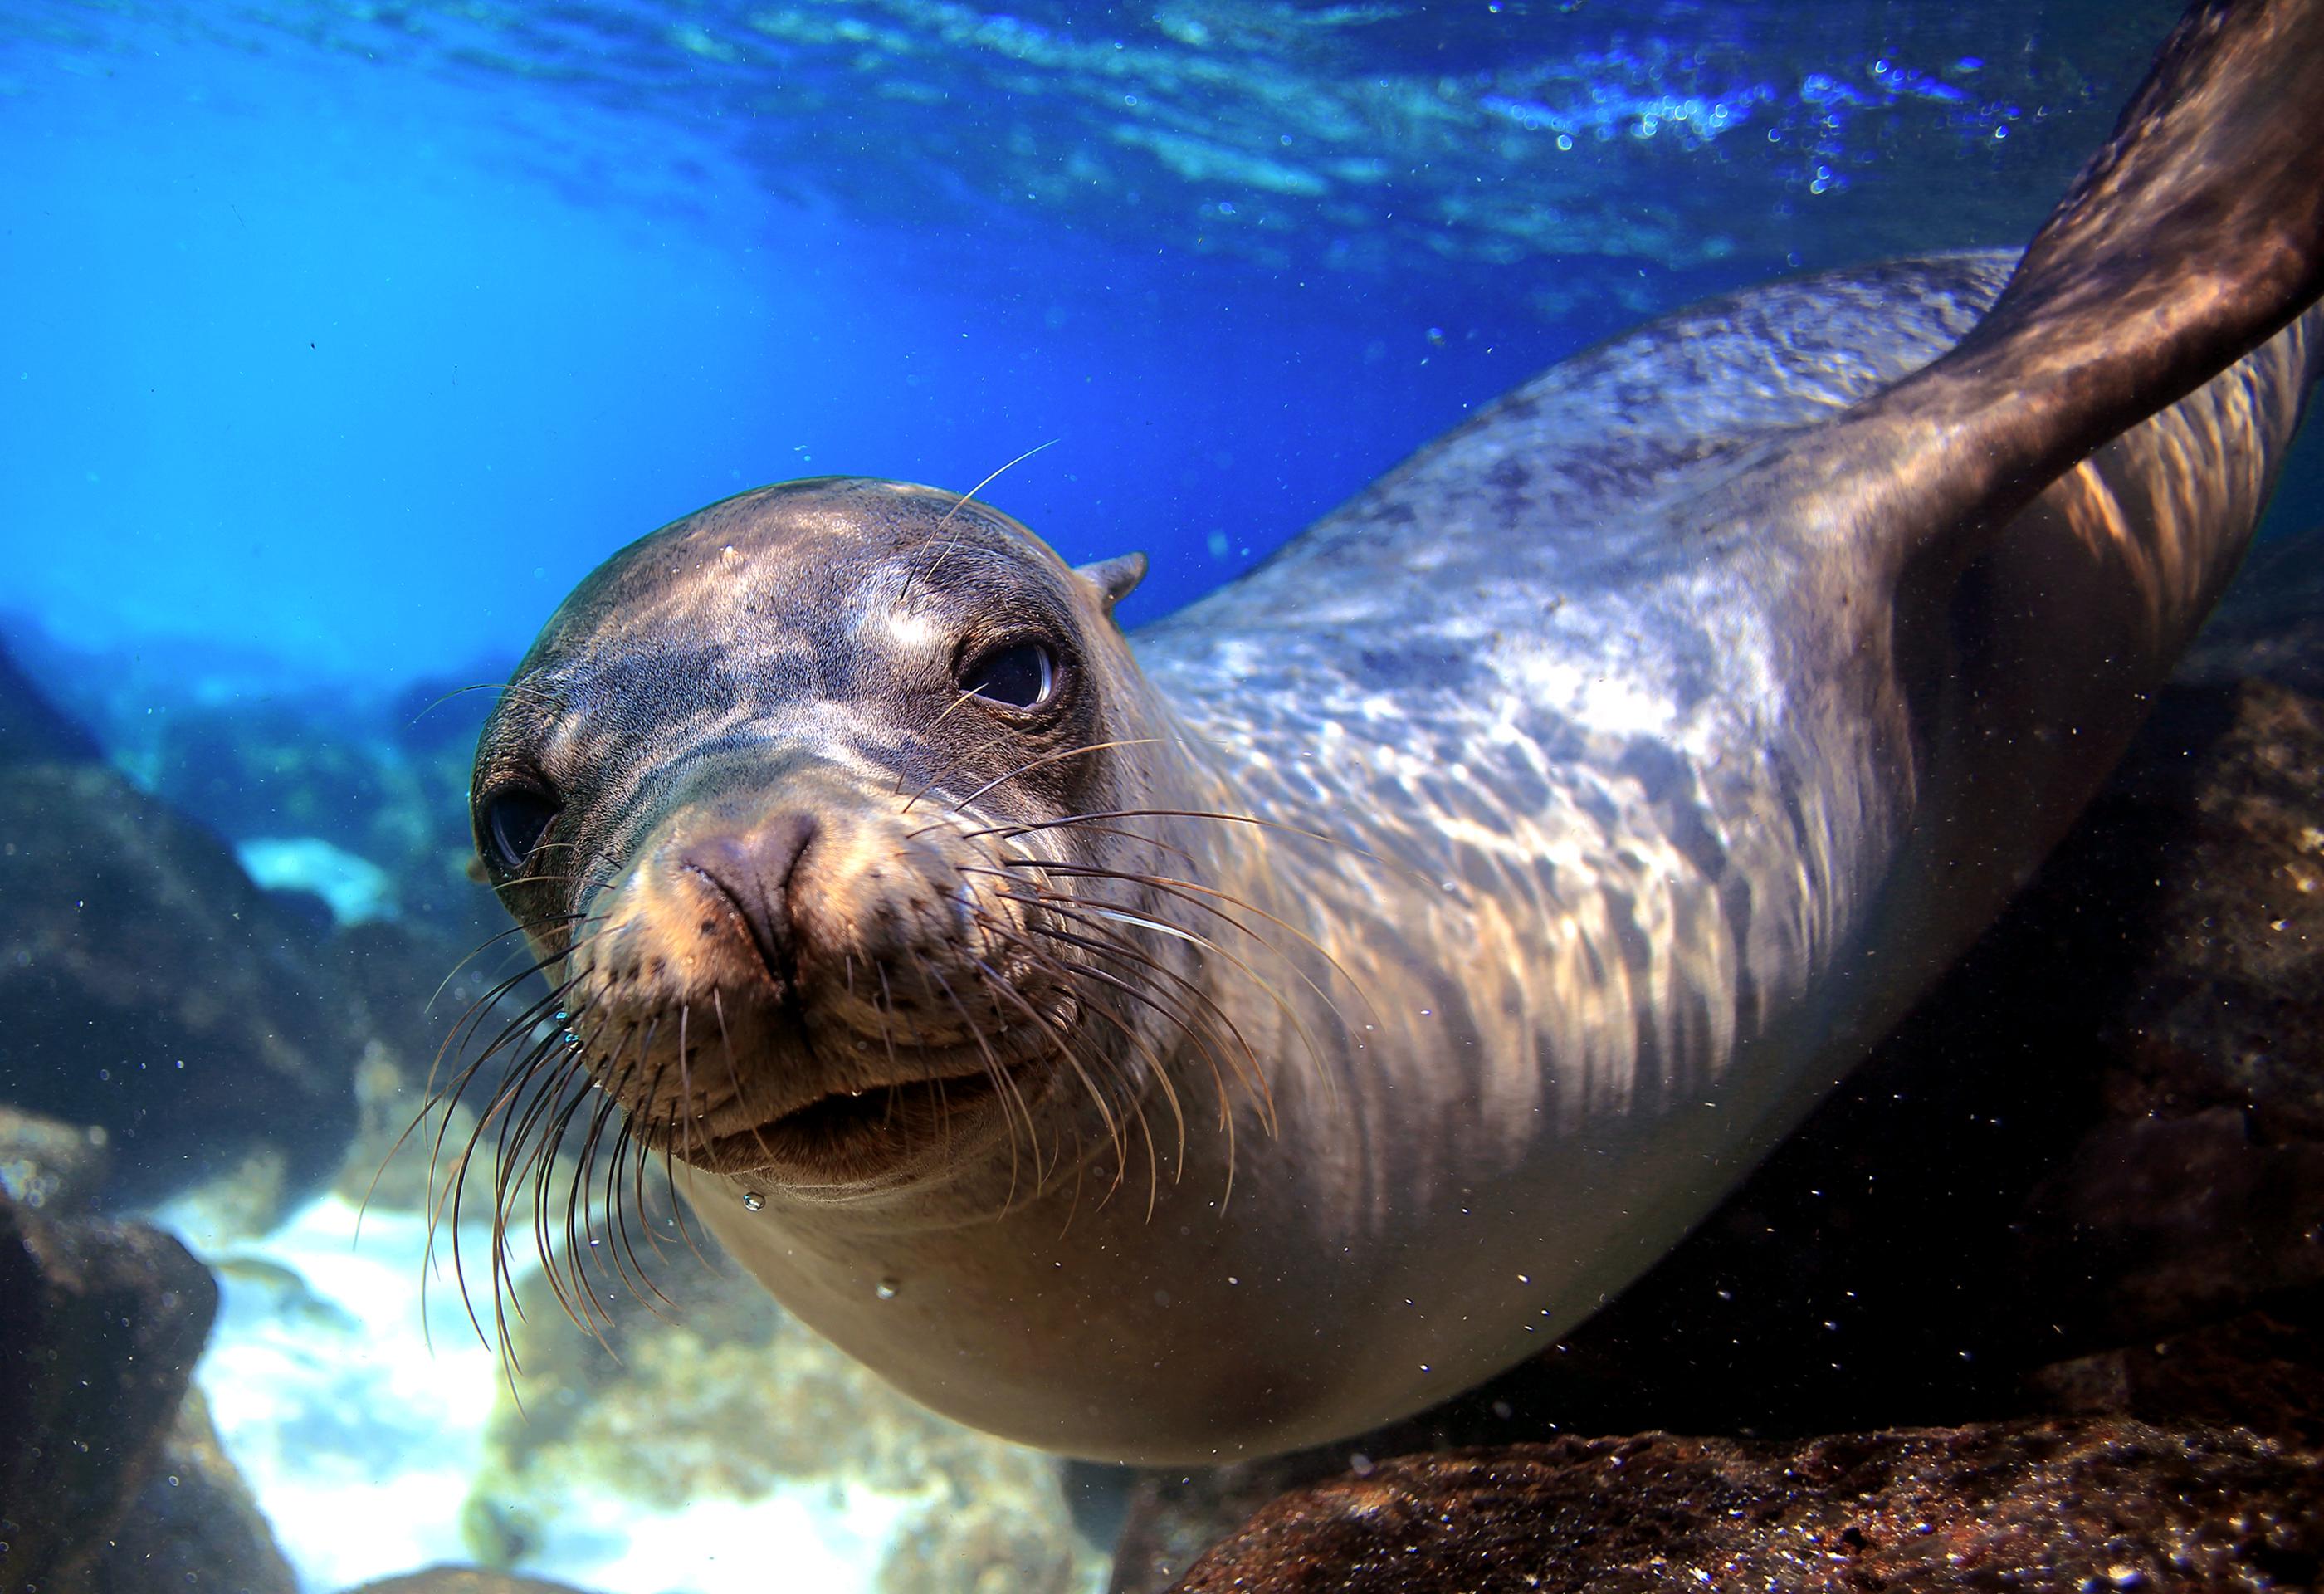 León marino (Shutterstock)